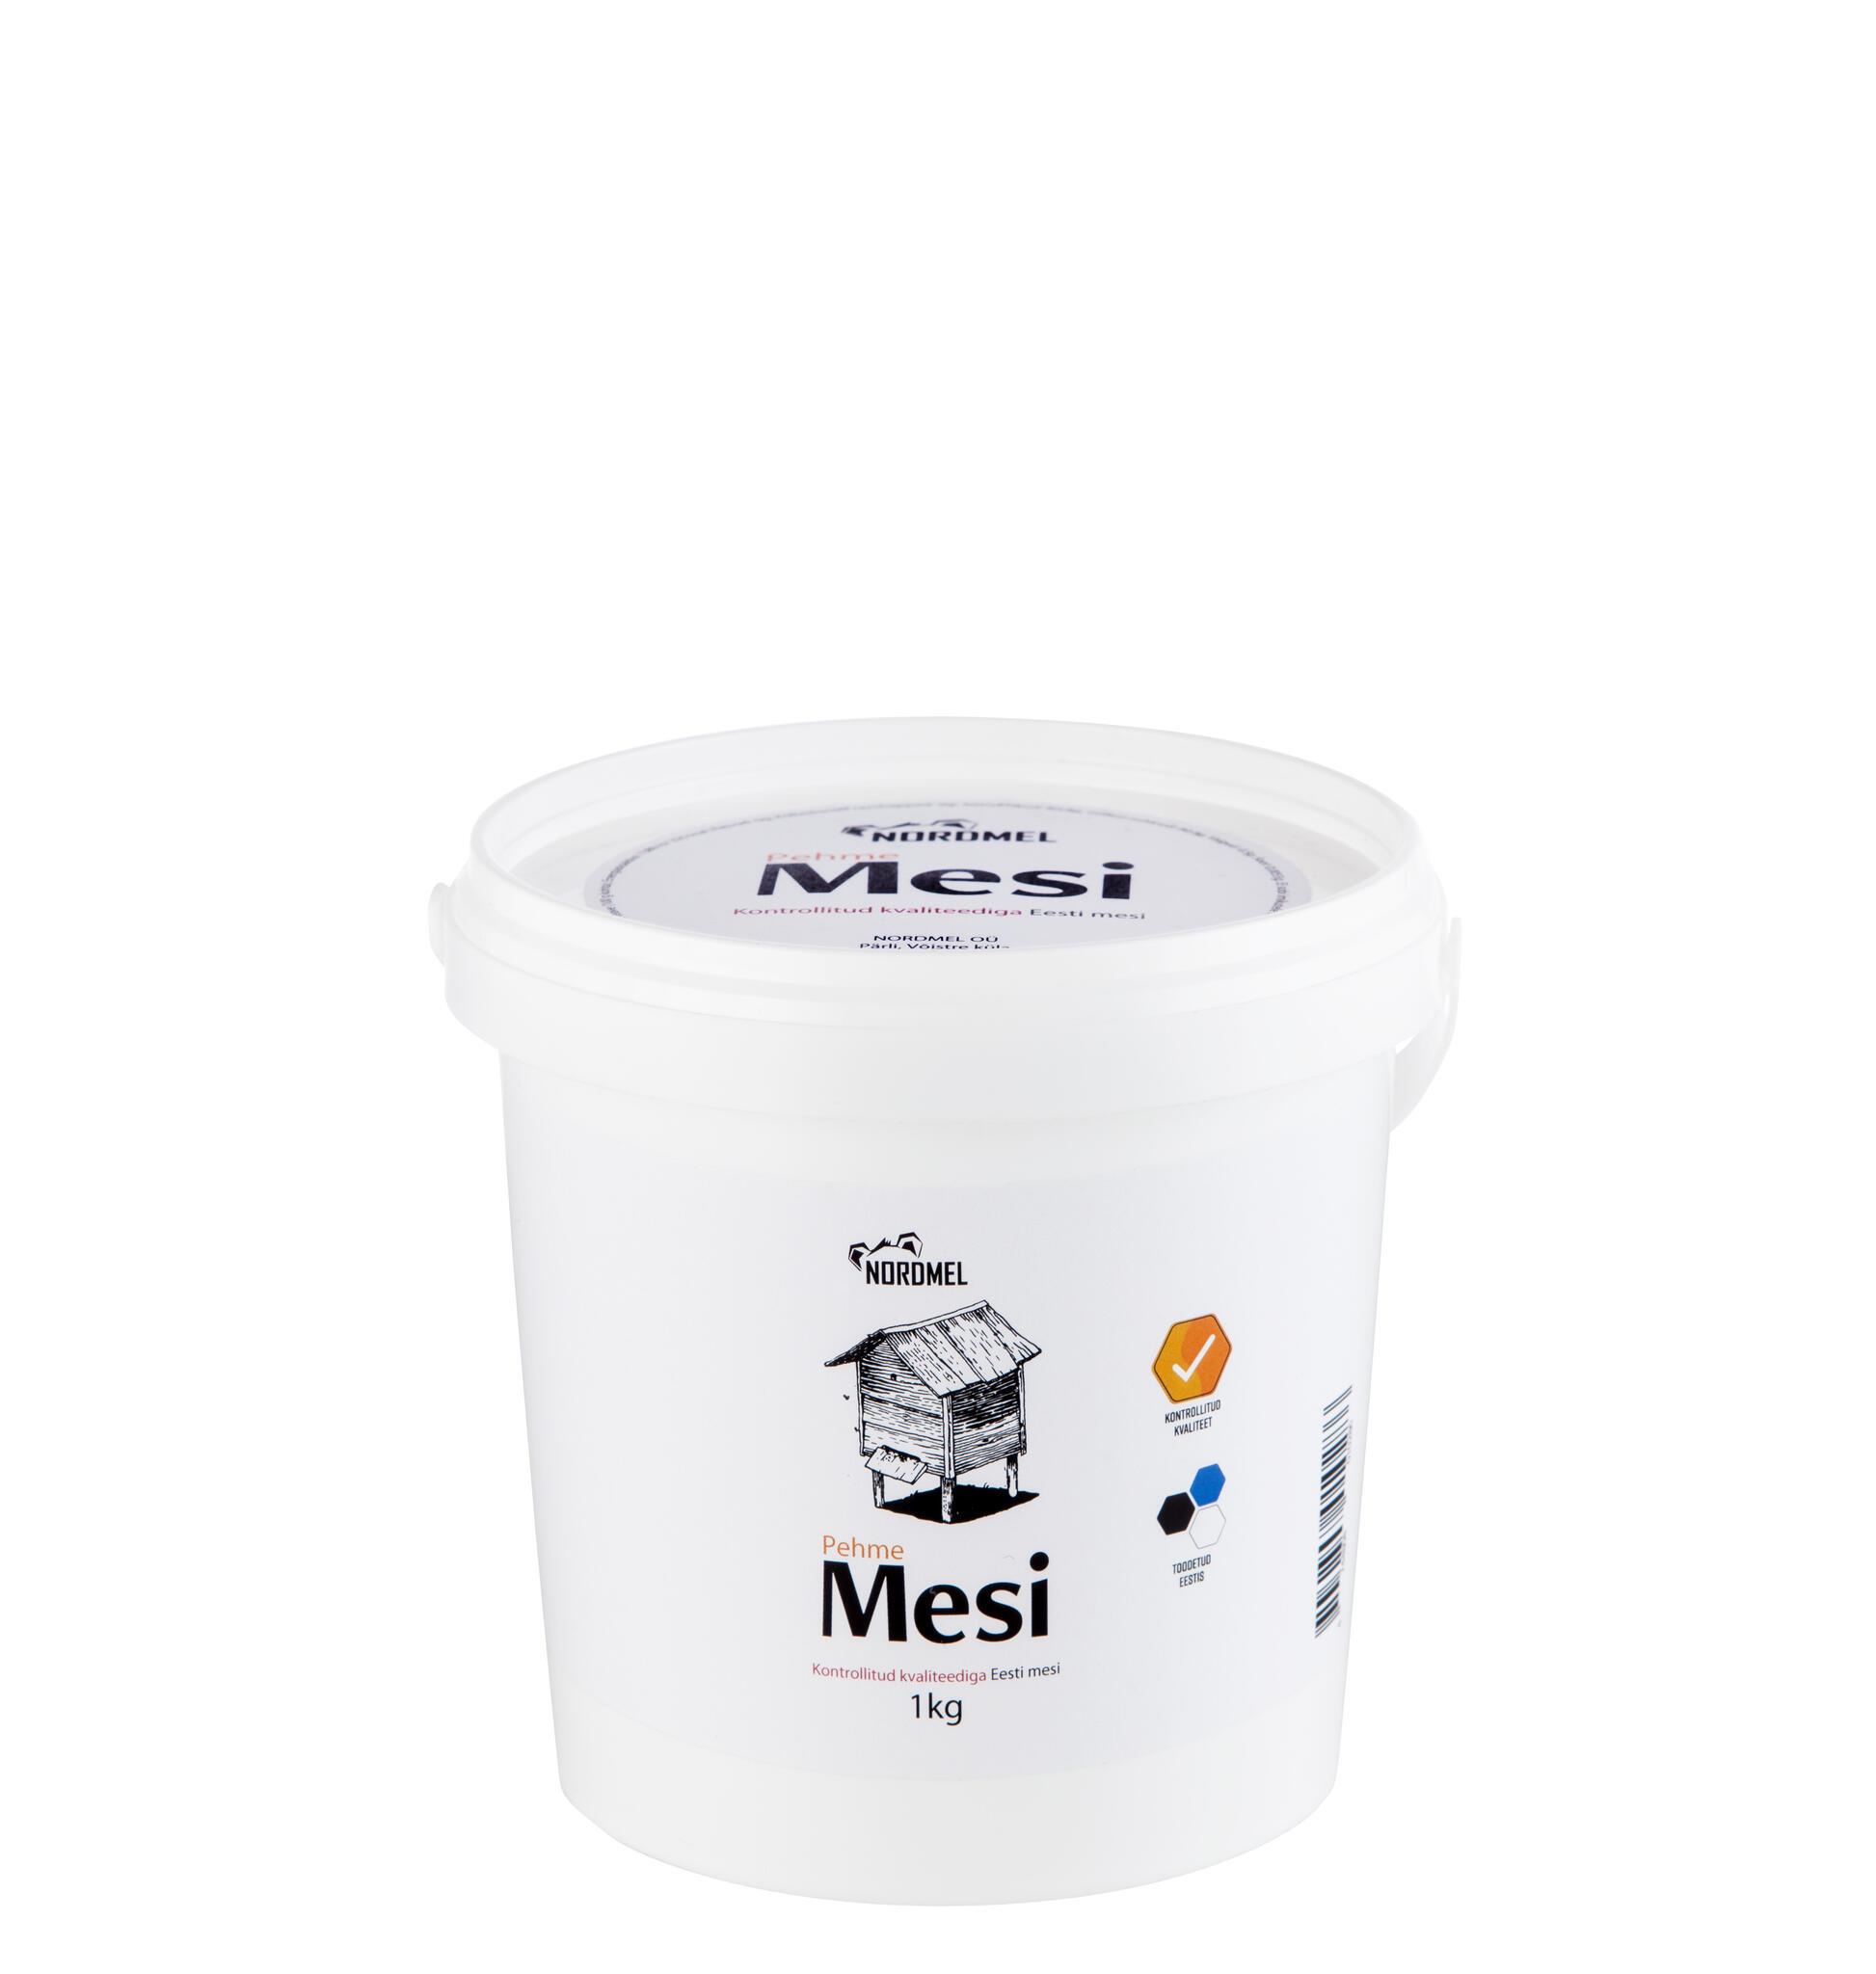 Mesi Nordmel ämber, pehme 1kg est (6)